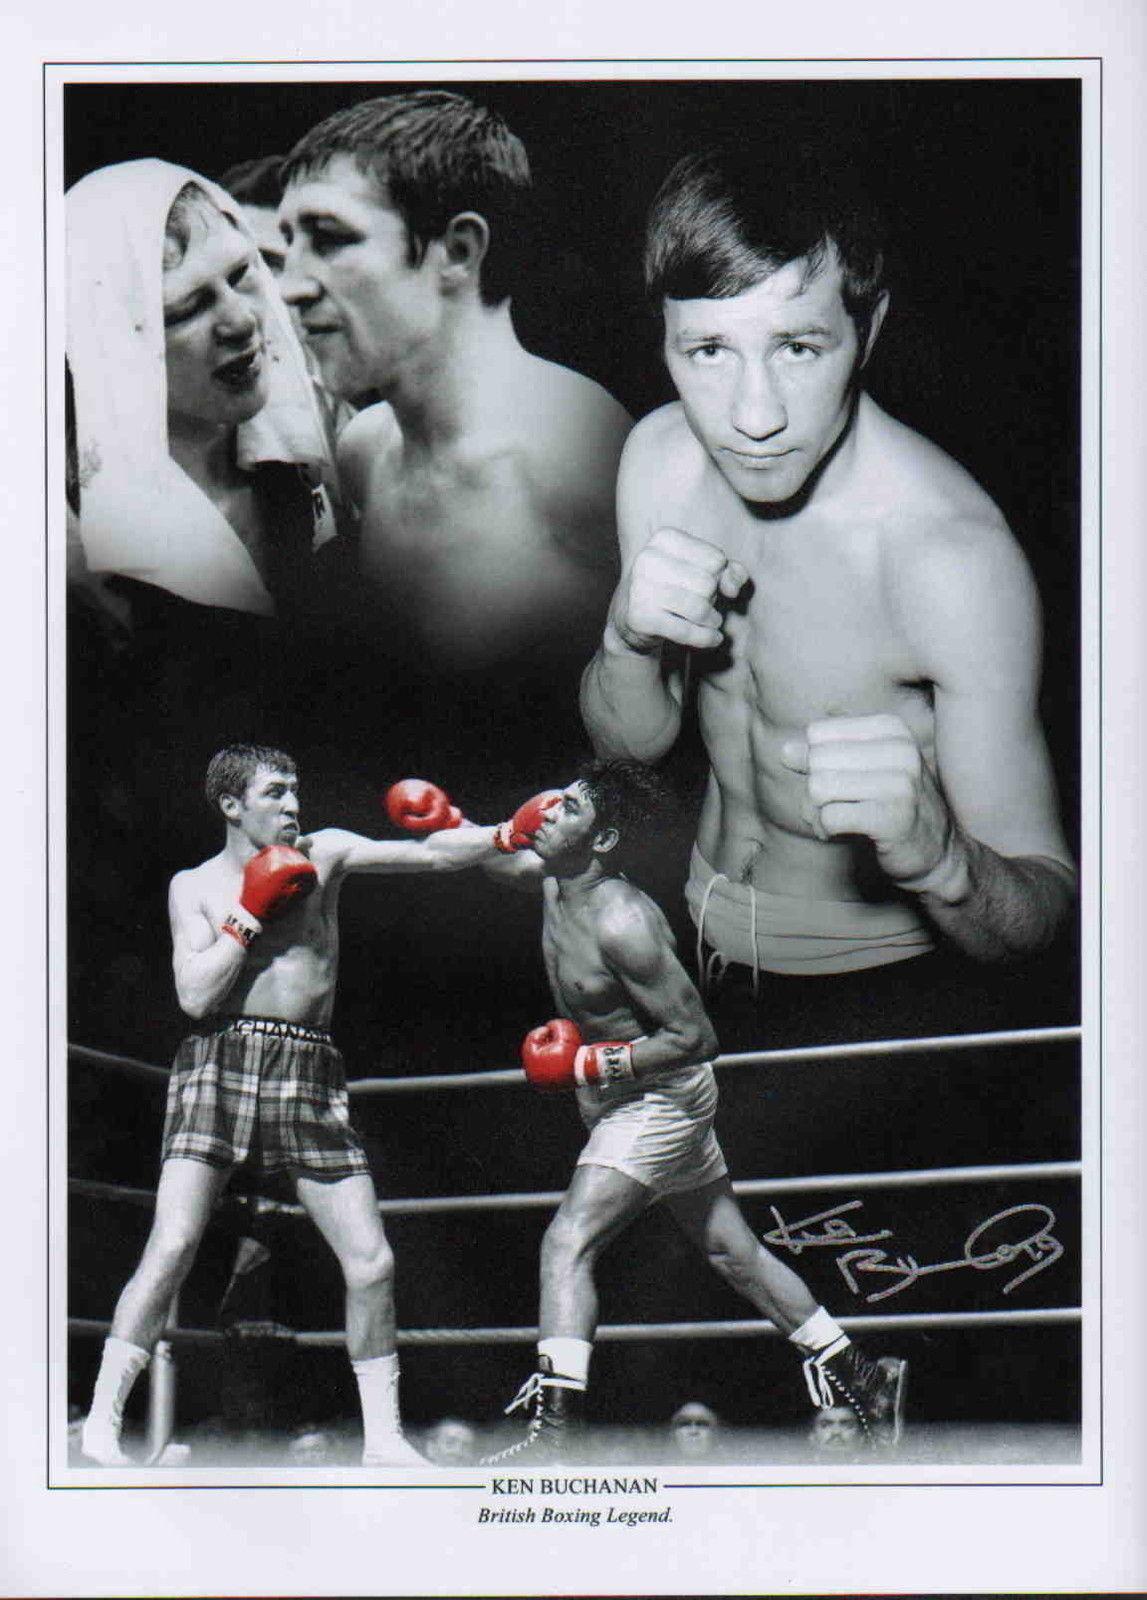 New Ken Buchanan  Hand Signed Portrait Black Boxing Glove